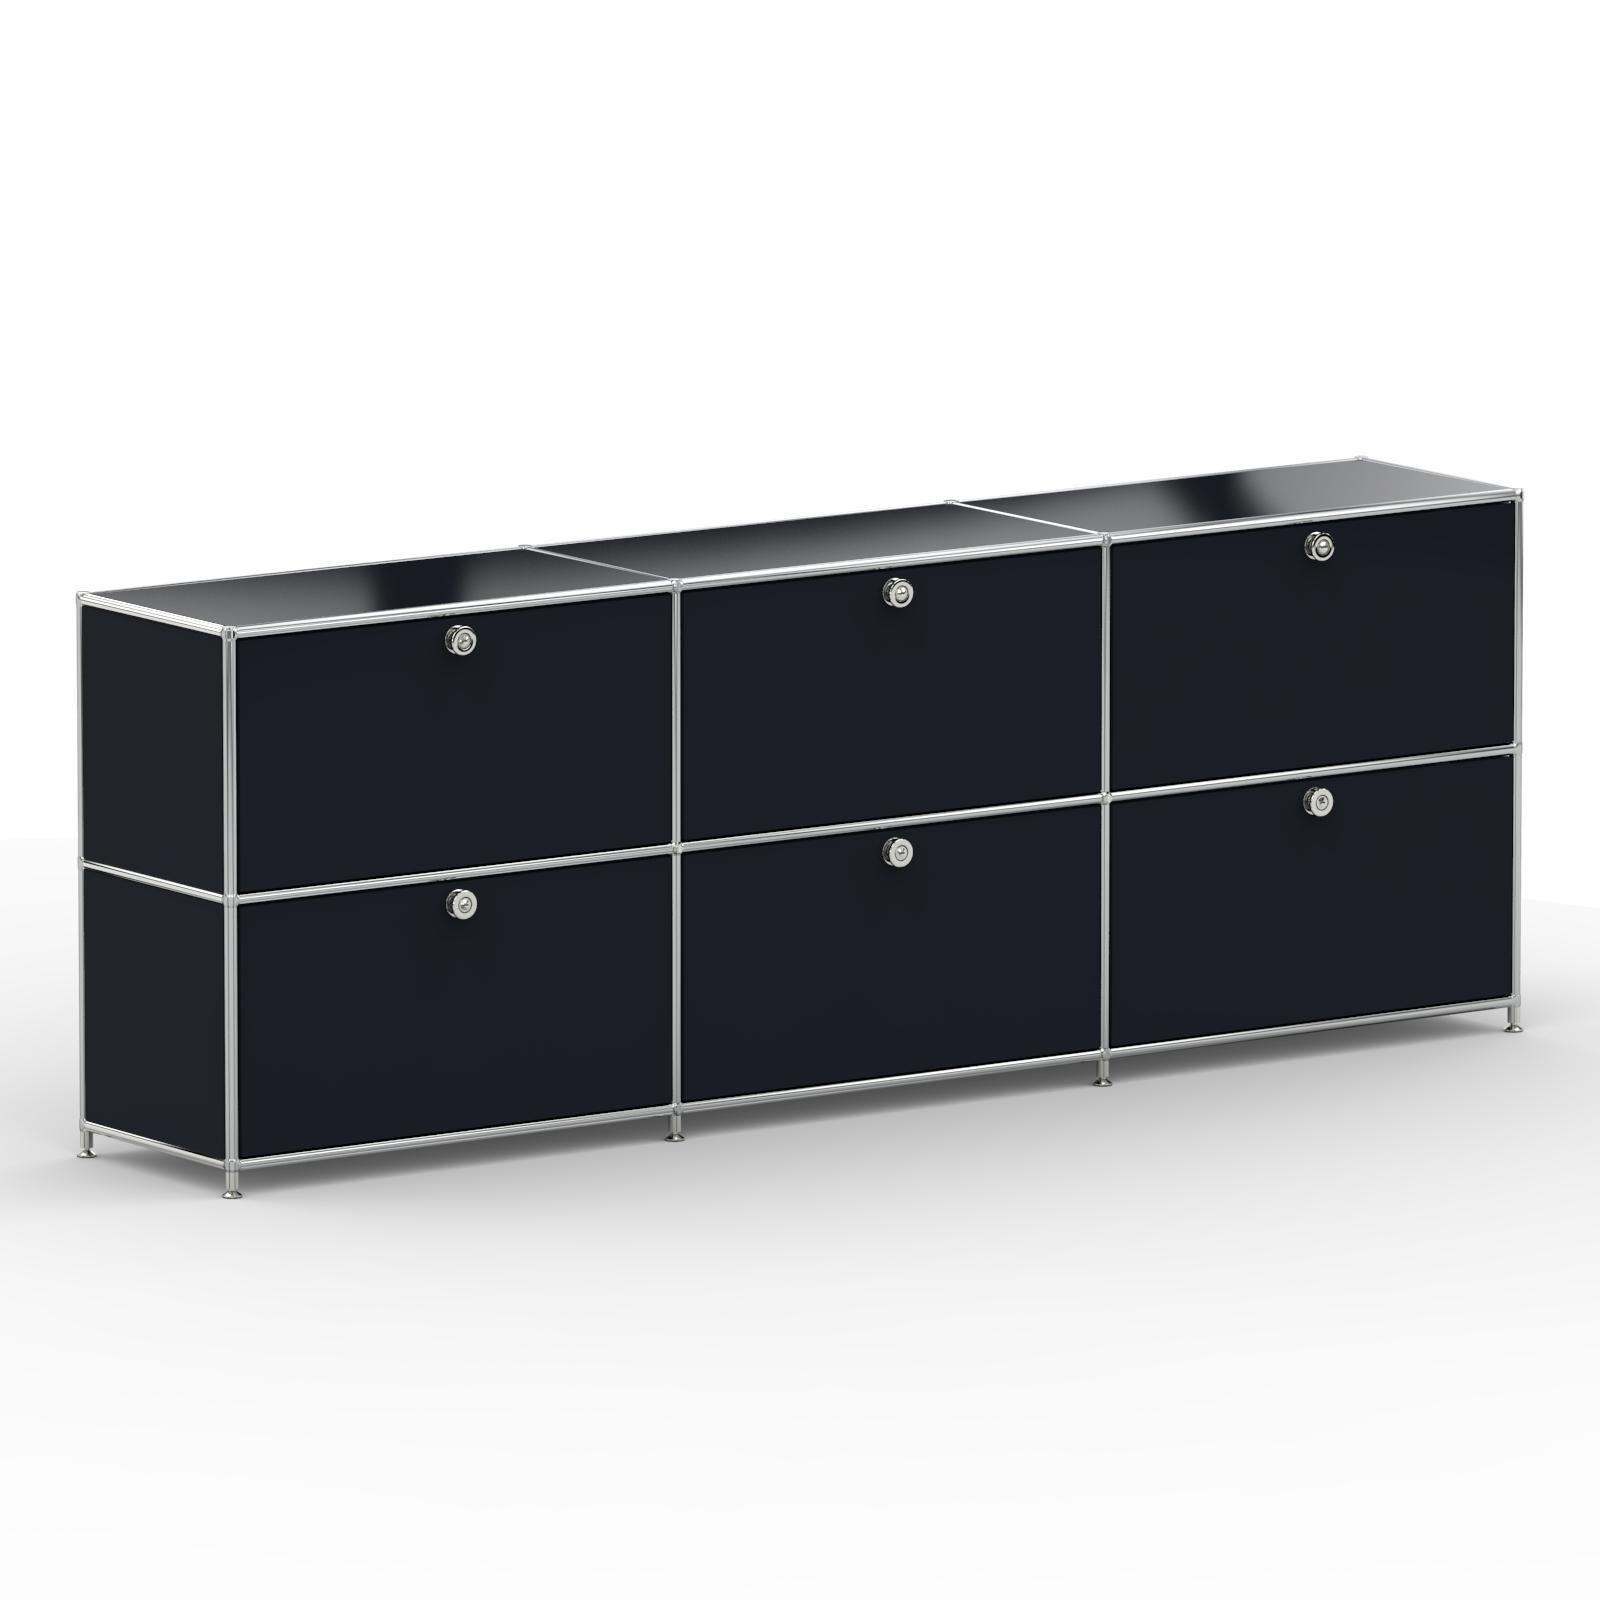 sideboard 6xschublade metall graphitschwarz versee. Black Bedroom Furniture Sets. Home Design Ideas